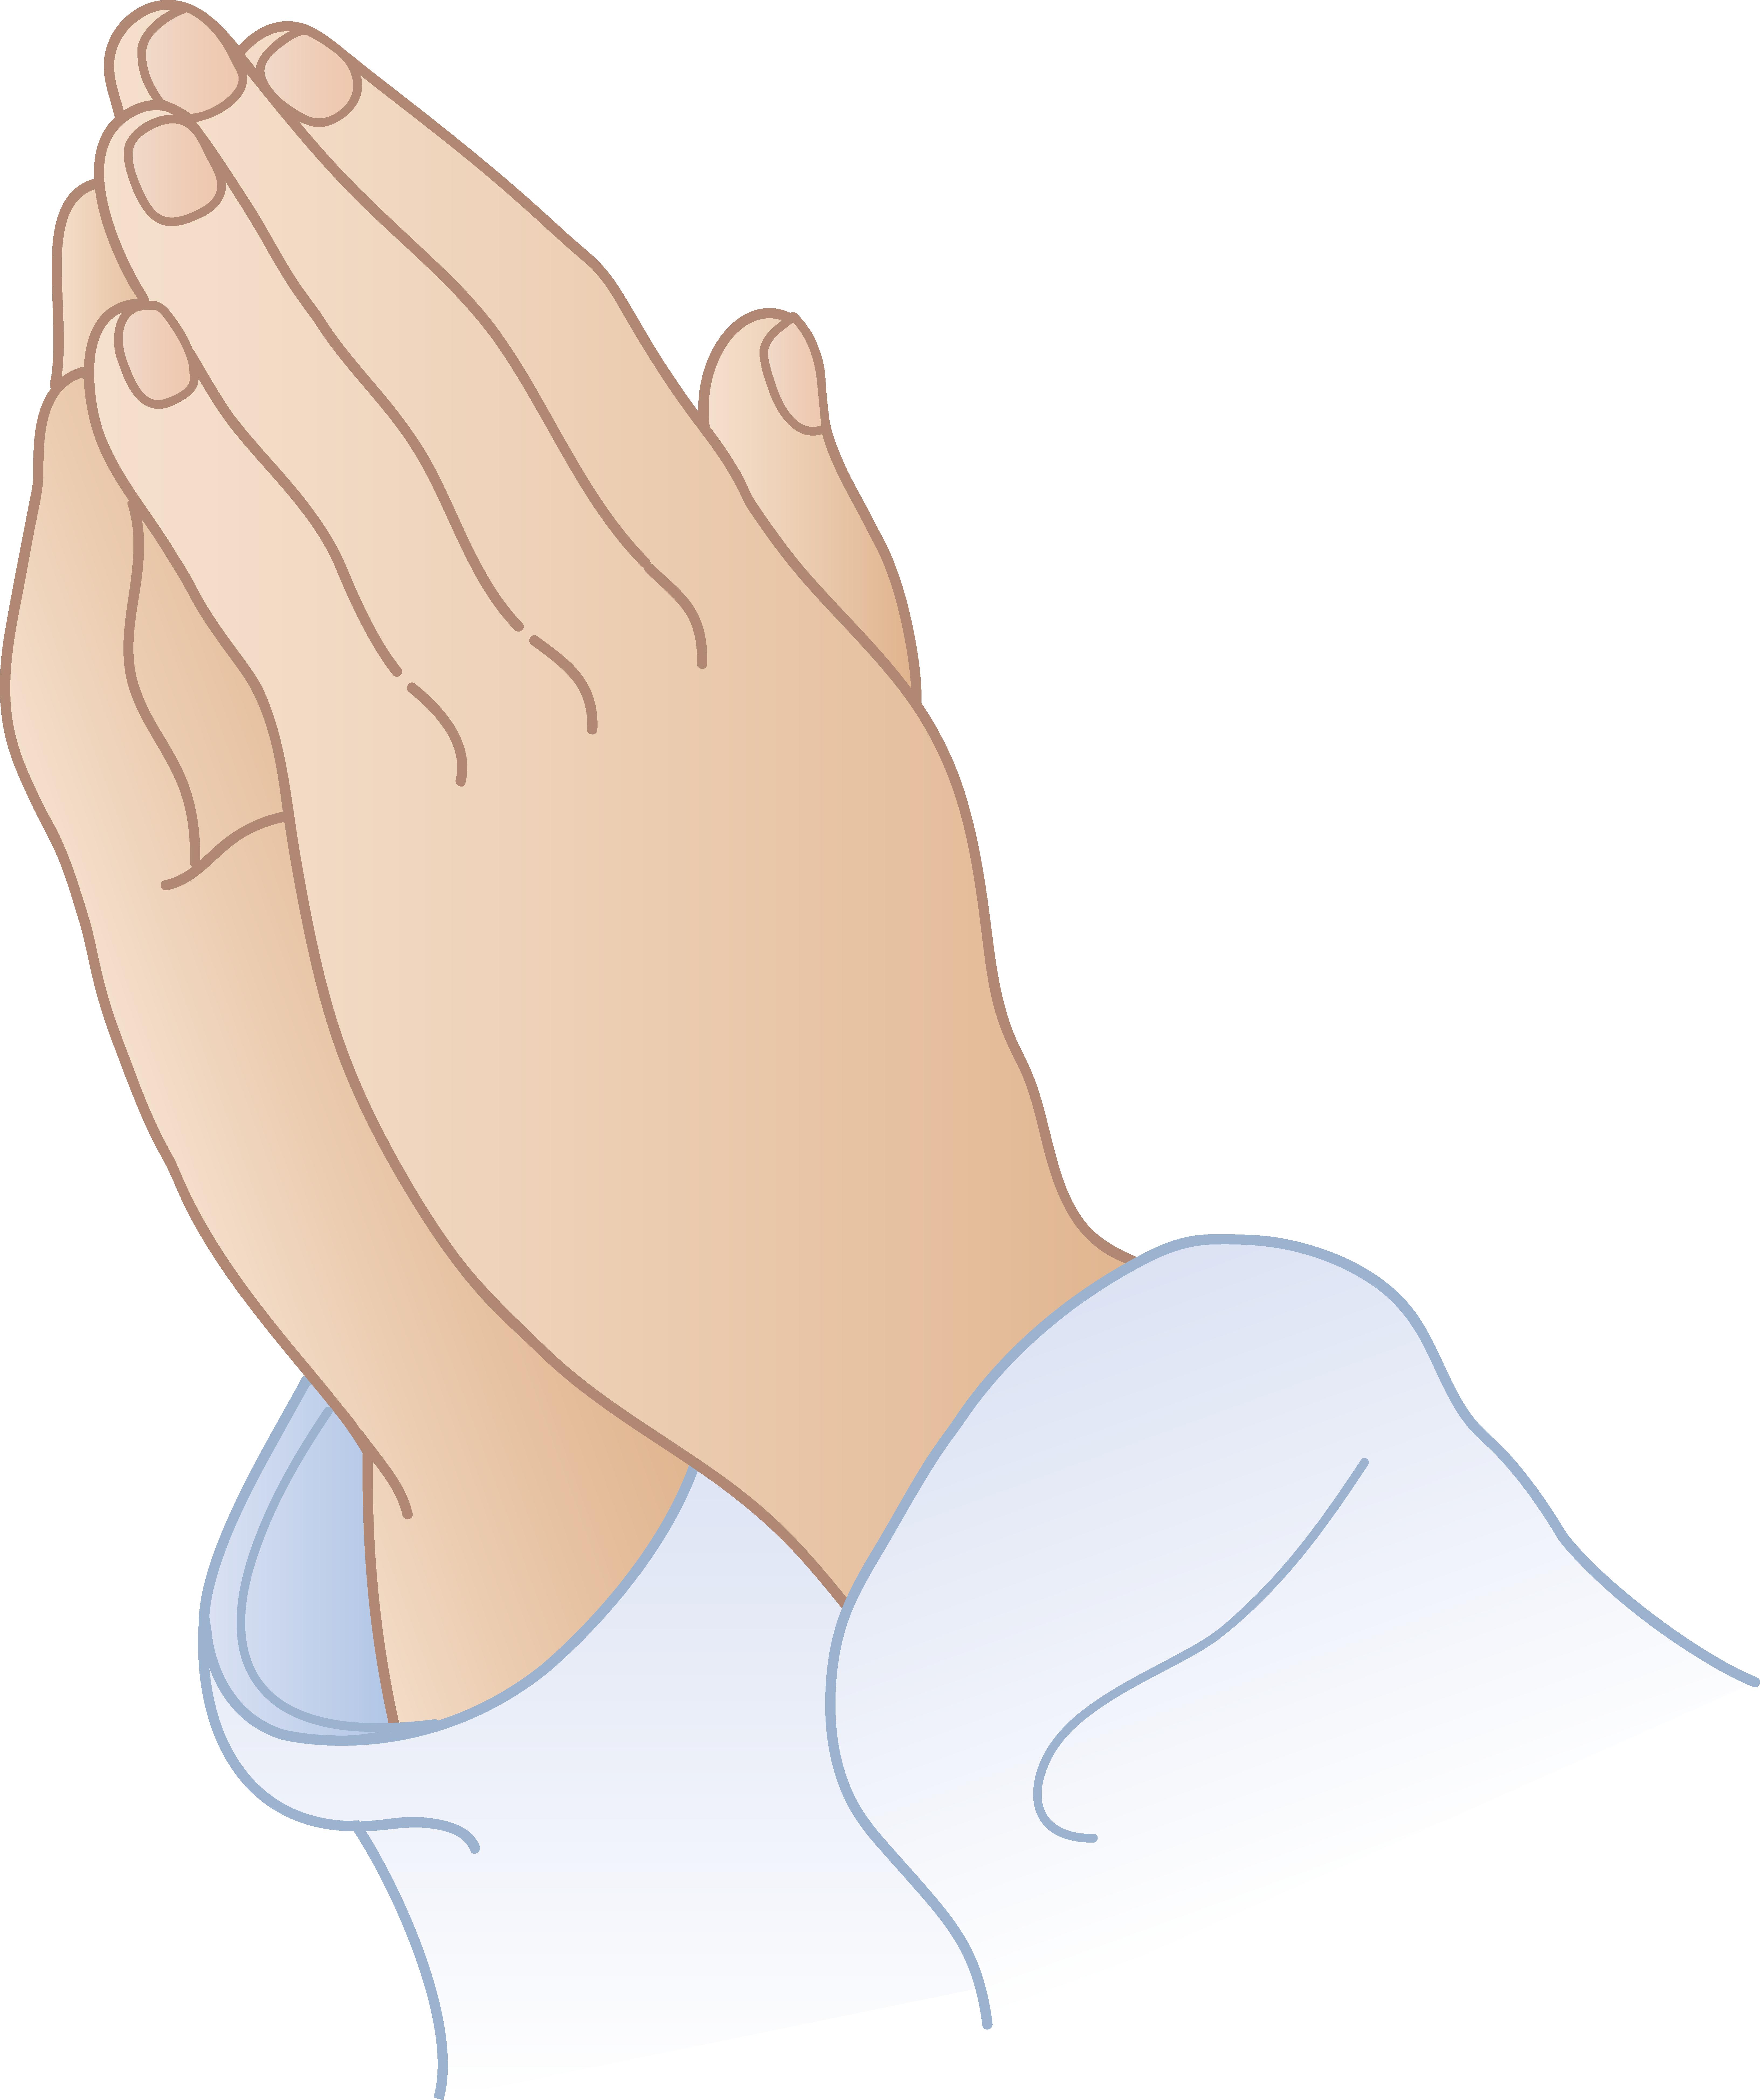 6530x7791 Praying Hands 1 Free Clip Art